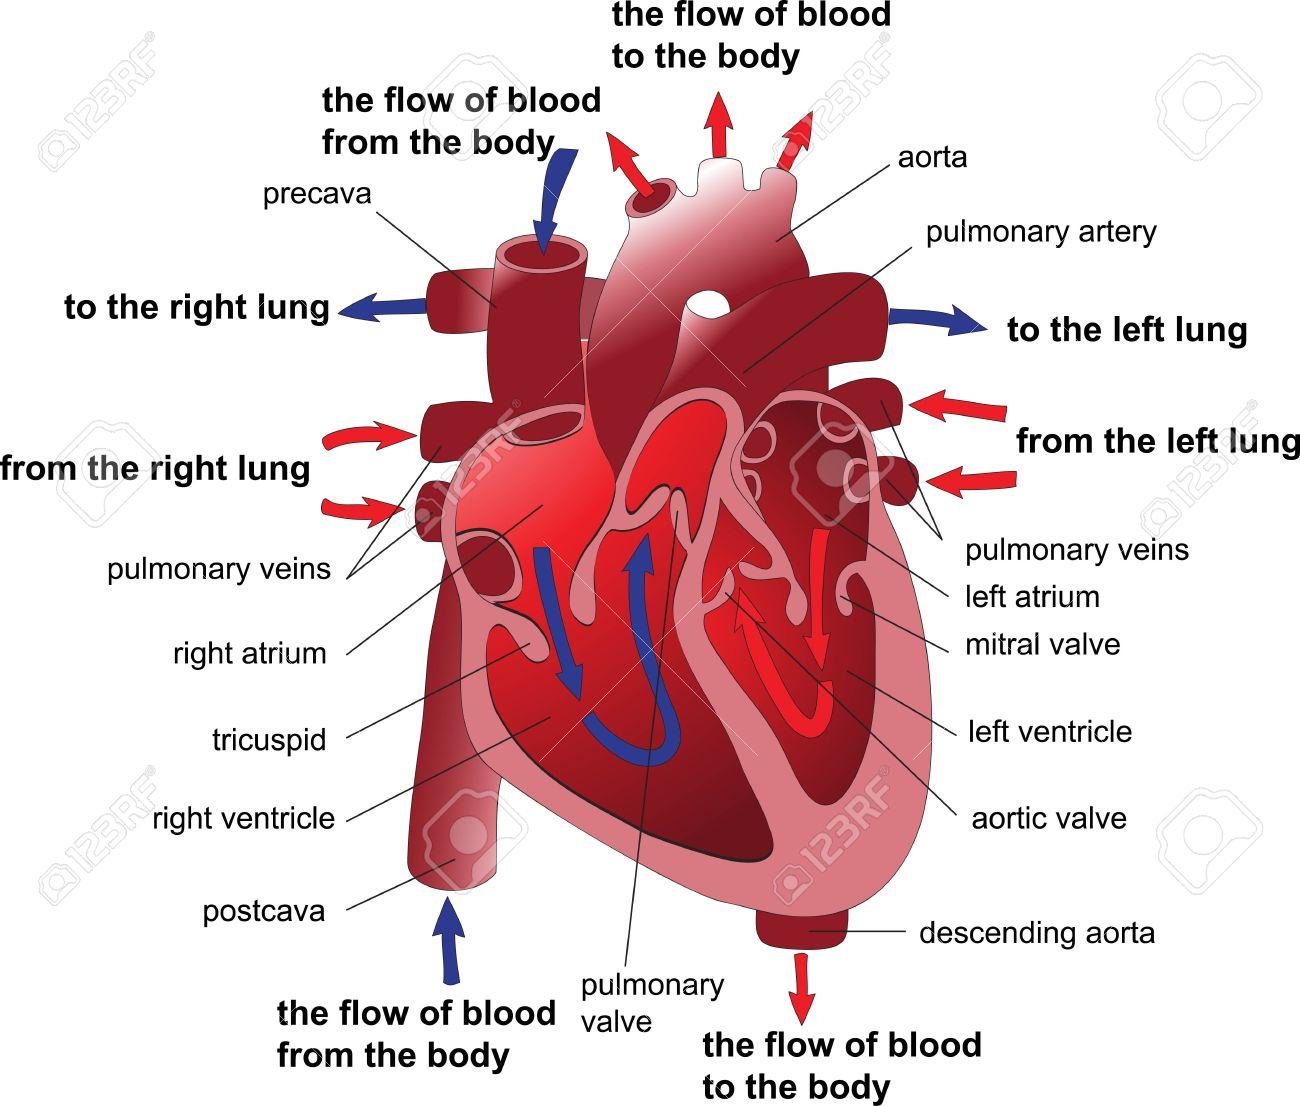 Human heart cross section  Poster Stock Vector - 16438916